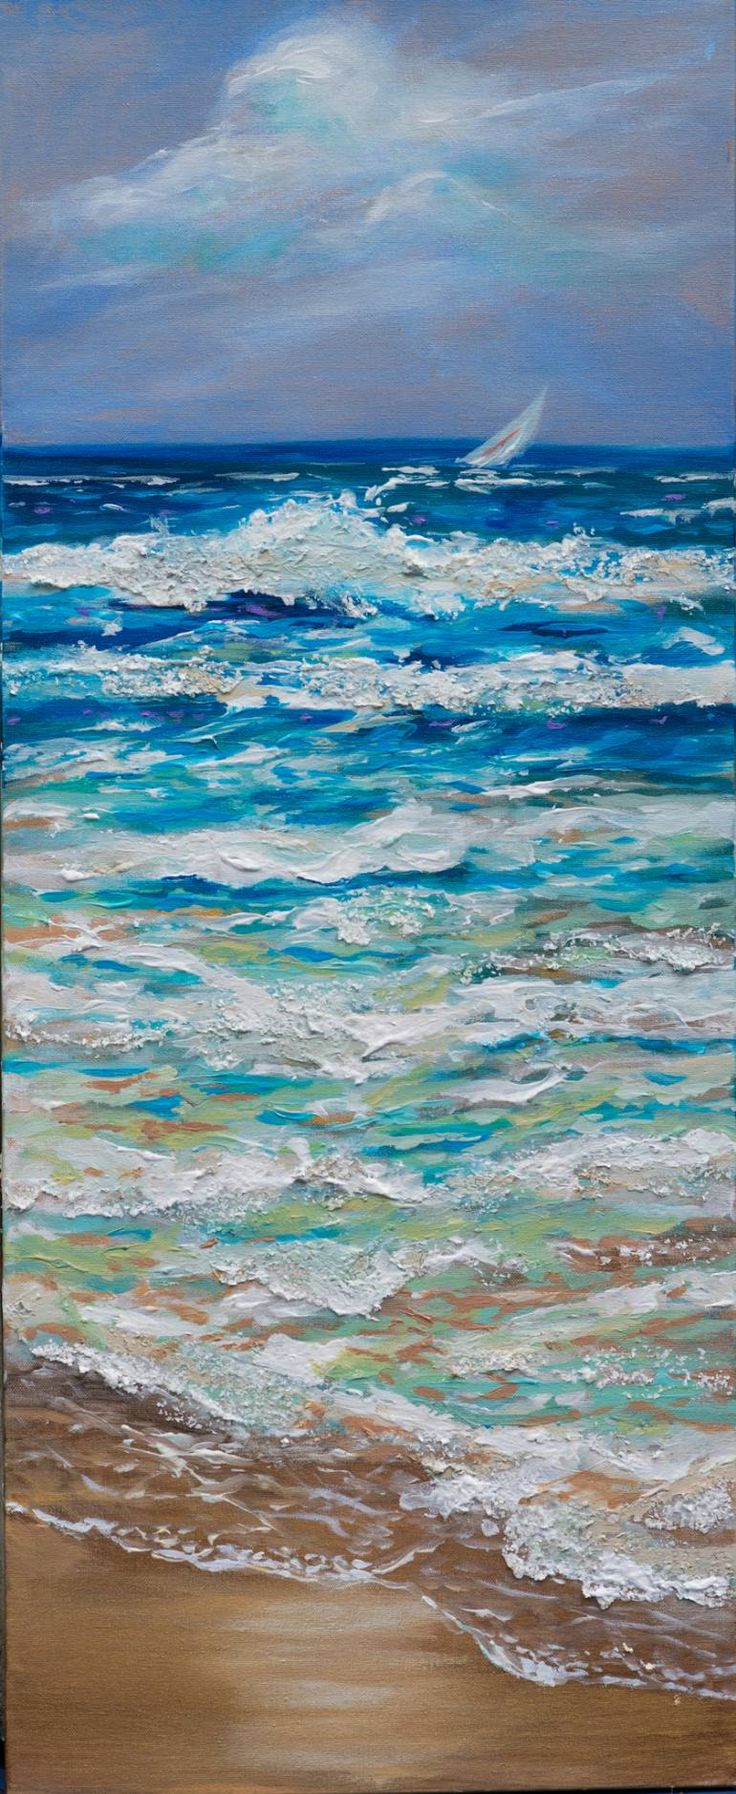 "Saatchi Art Artist Linda Olsen; Painting, ""Windy Day"" #art"